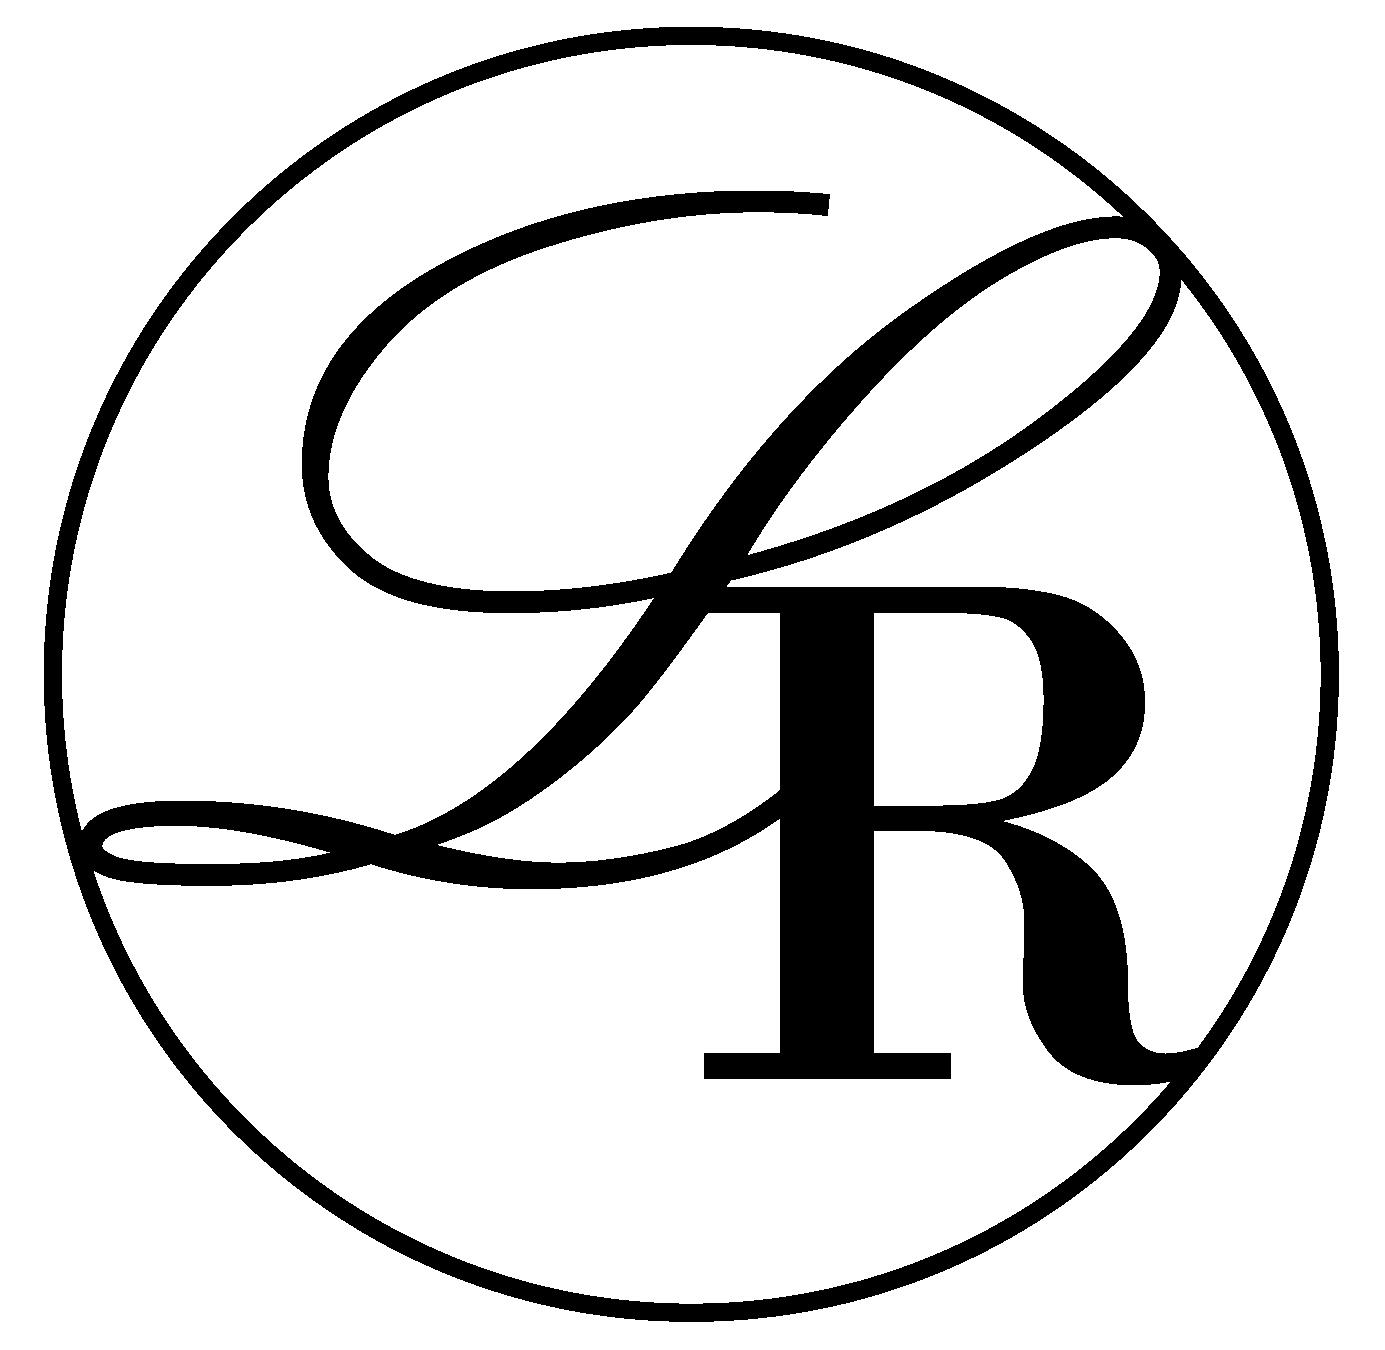 LaVine Emblem-Black